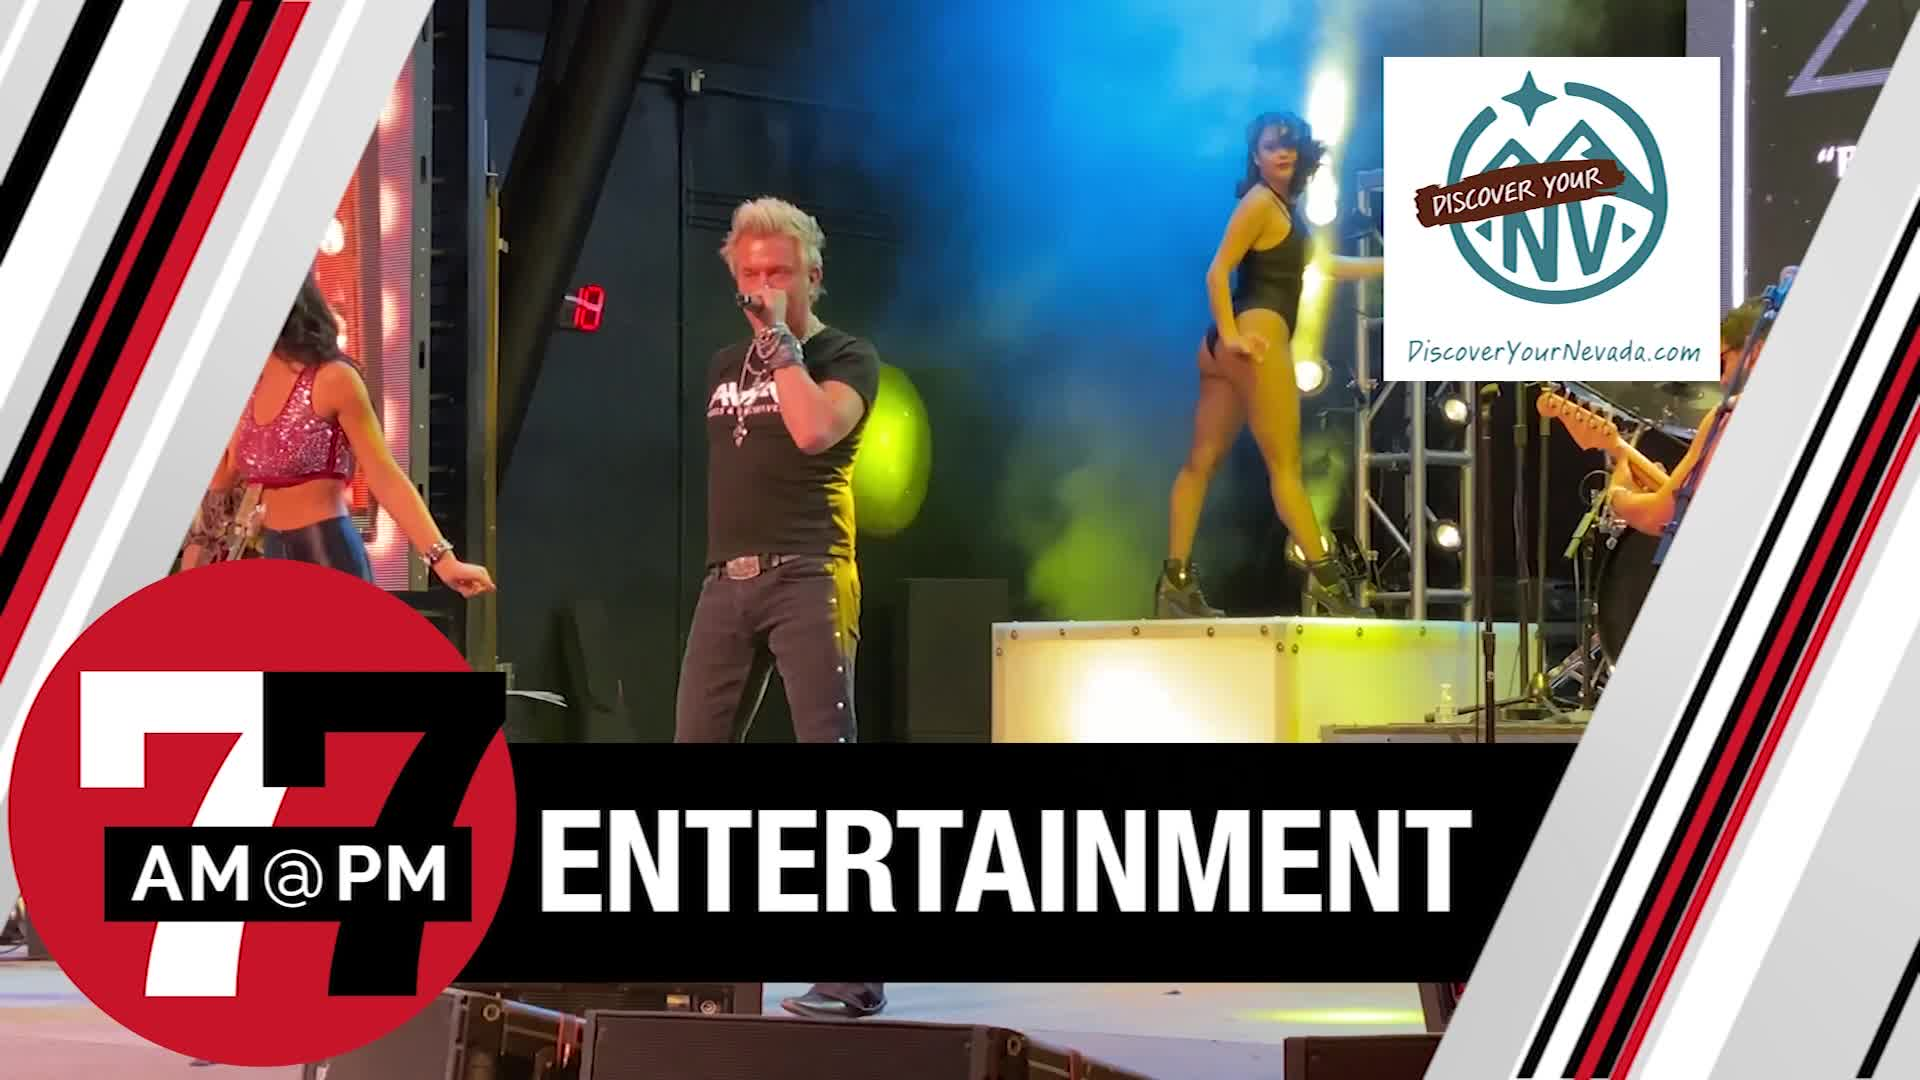 7@7PM Fremont Street Experience Kicks-Off Live Entertainment